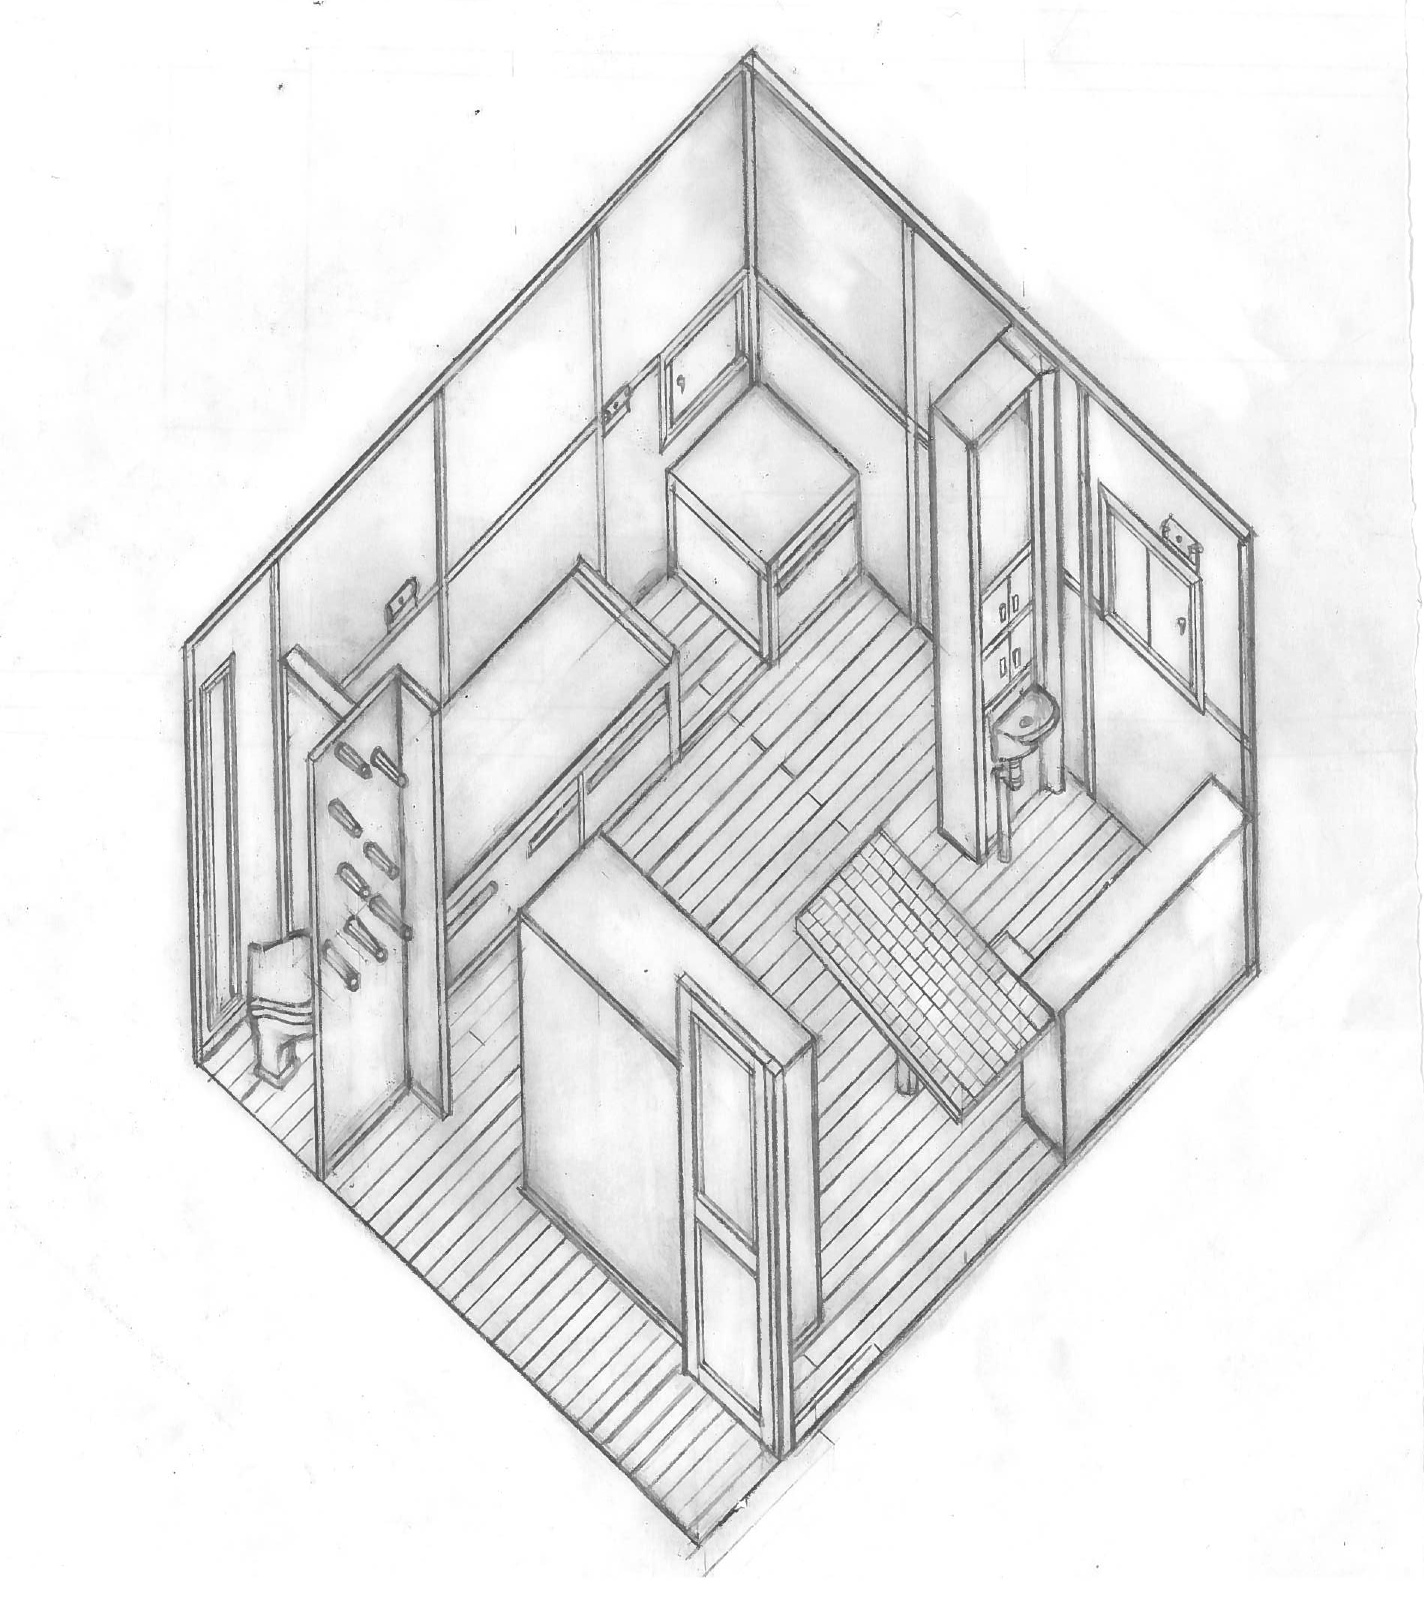 Petit Cabanon: DRAWING SET - Cabanon Le Corbusier